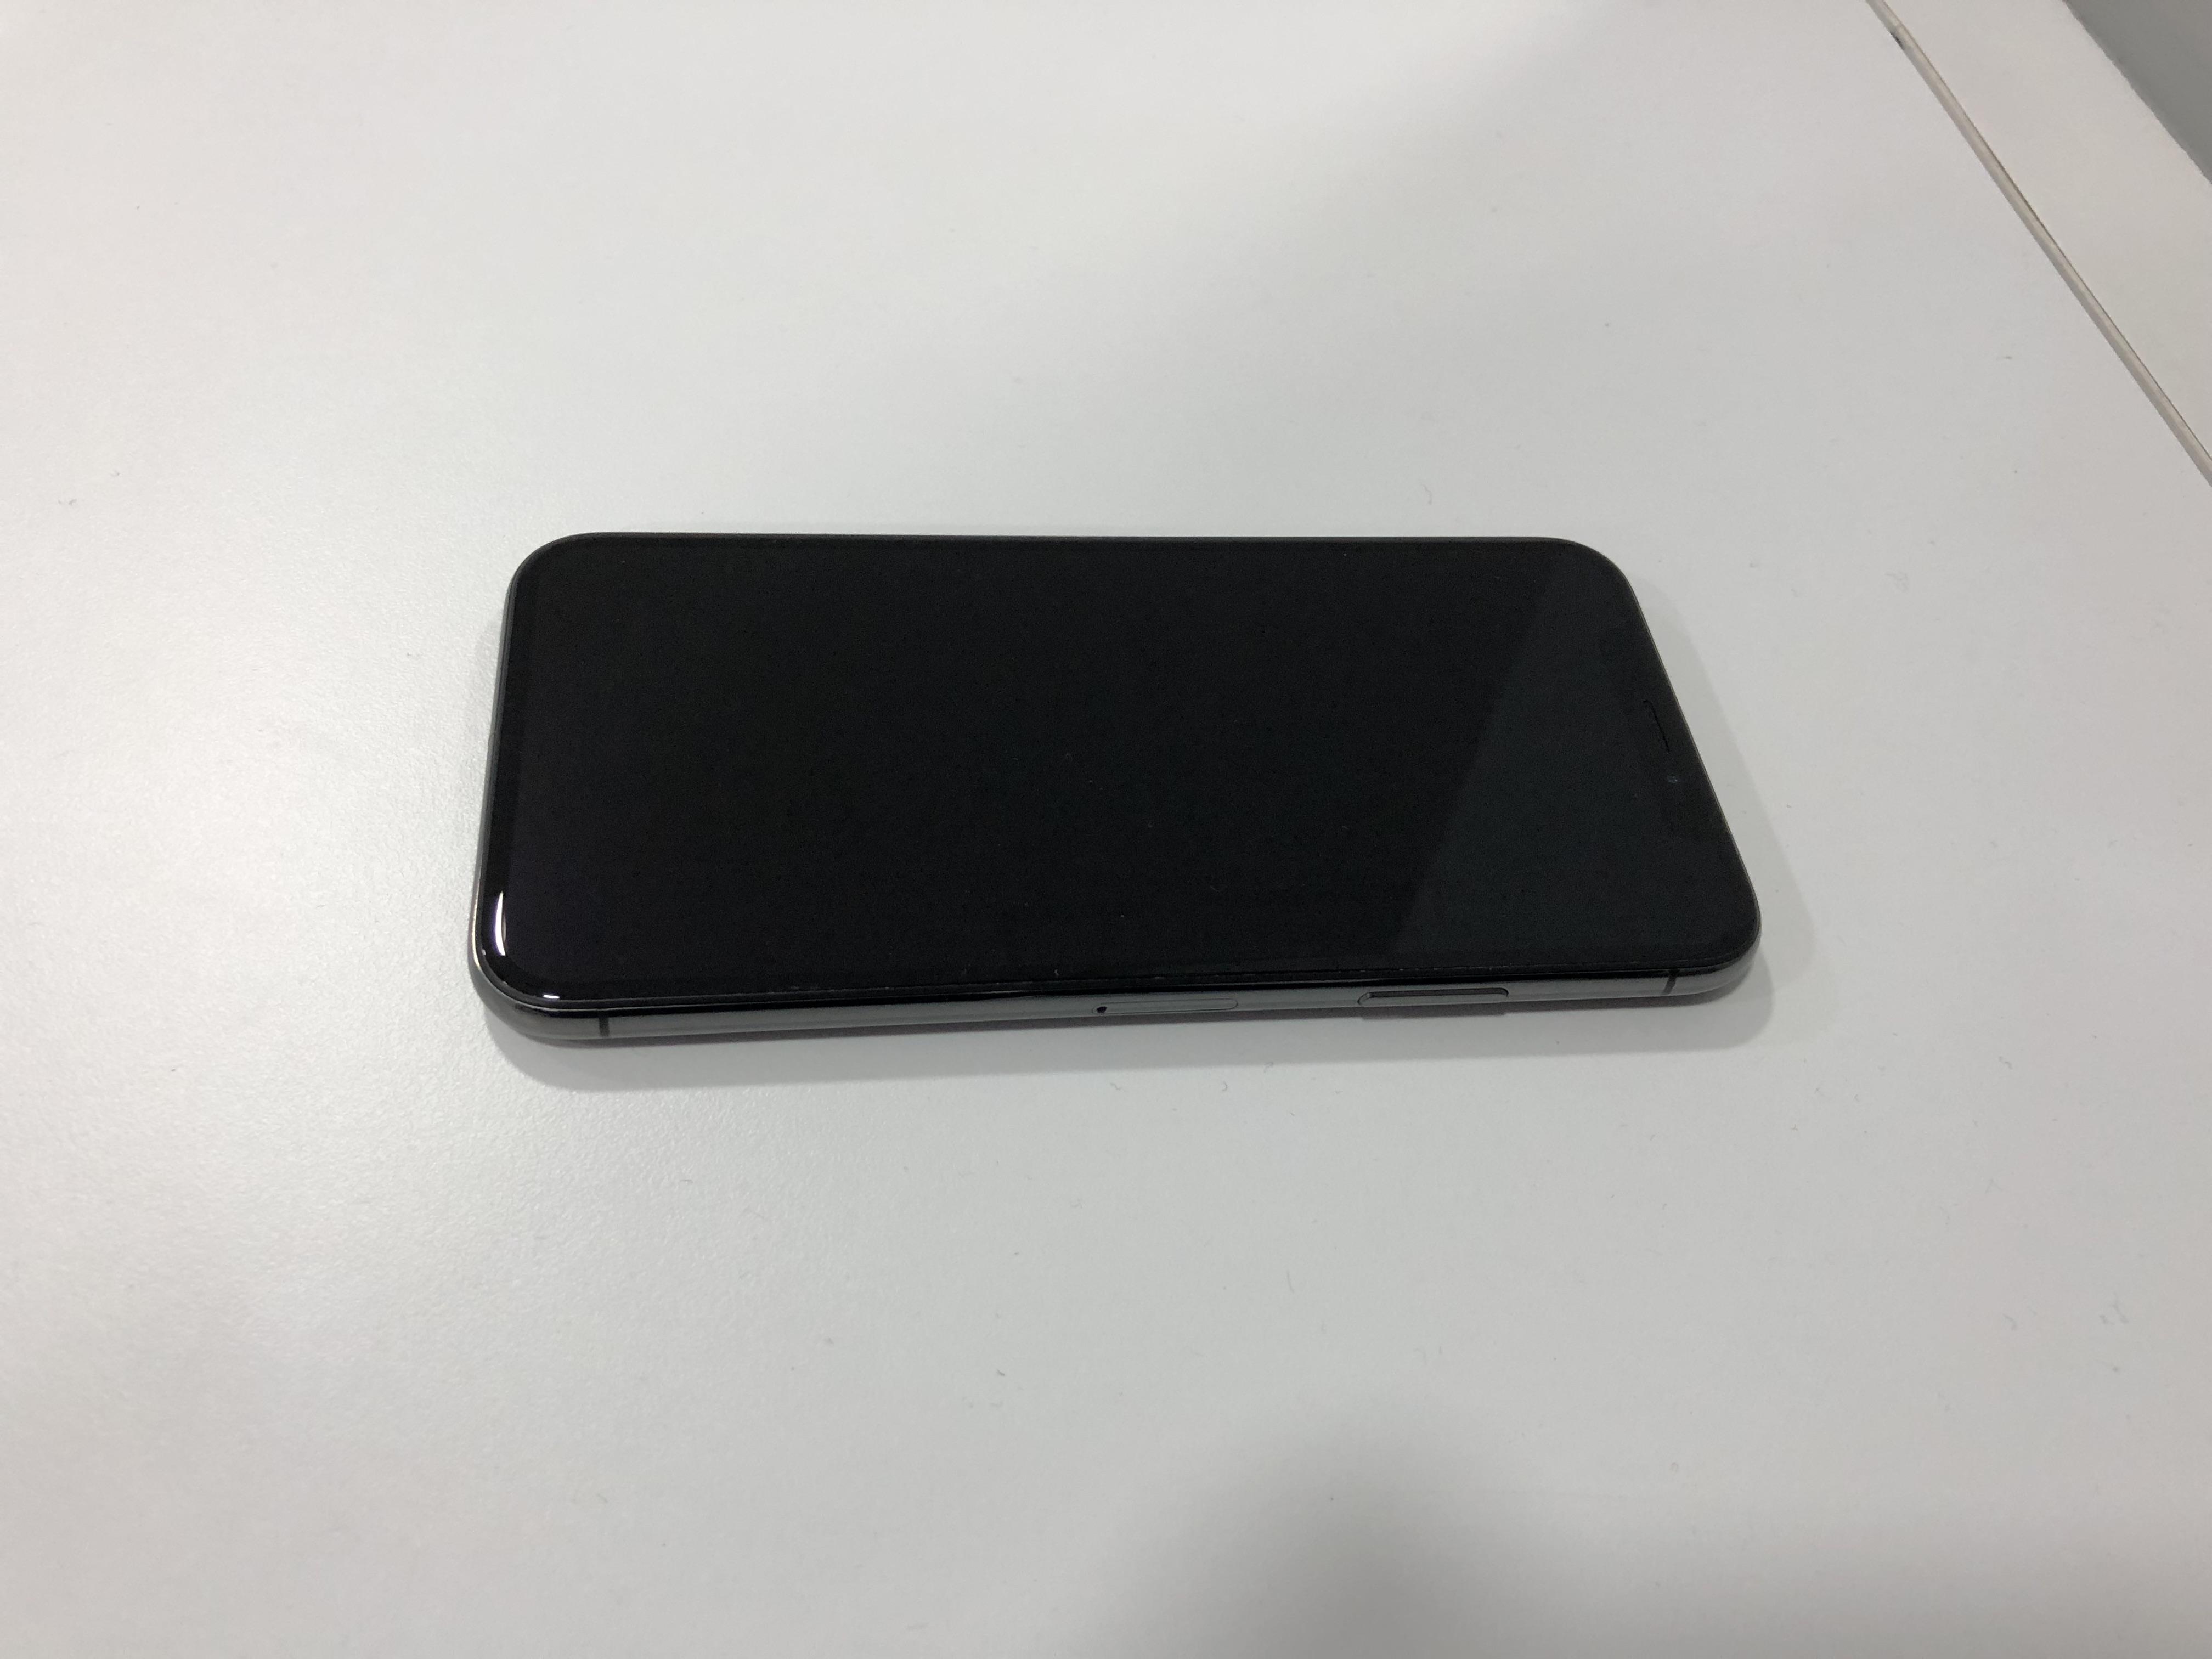 iPhone X 64GB, 64 GB, Space Gray, imagen 1